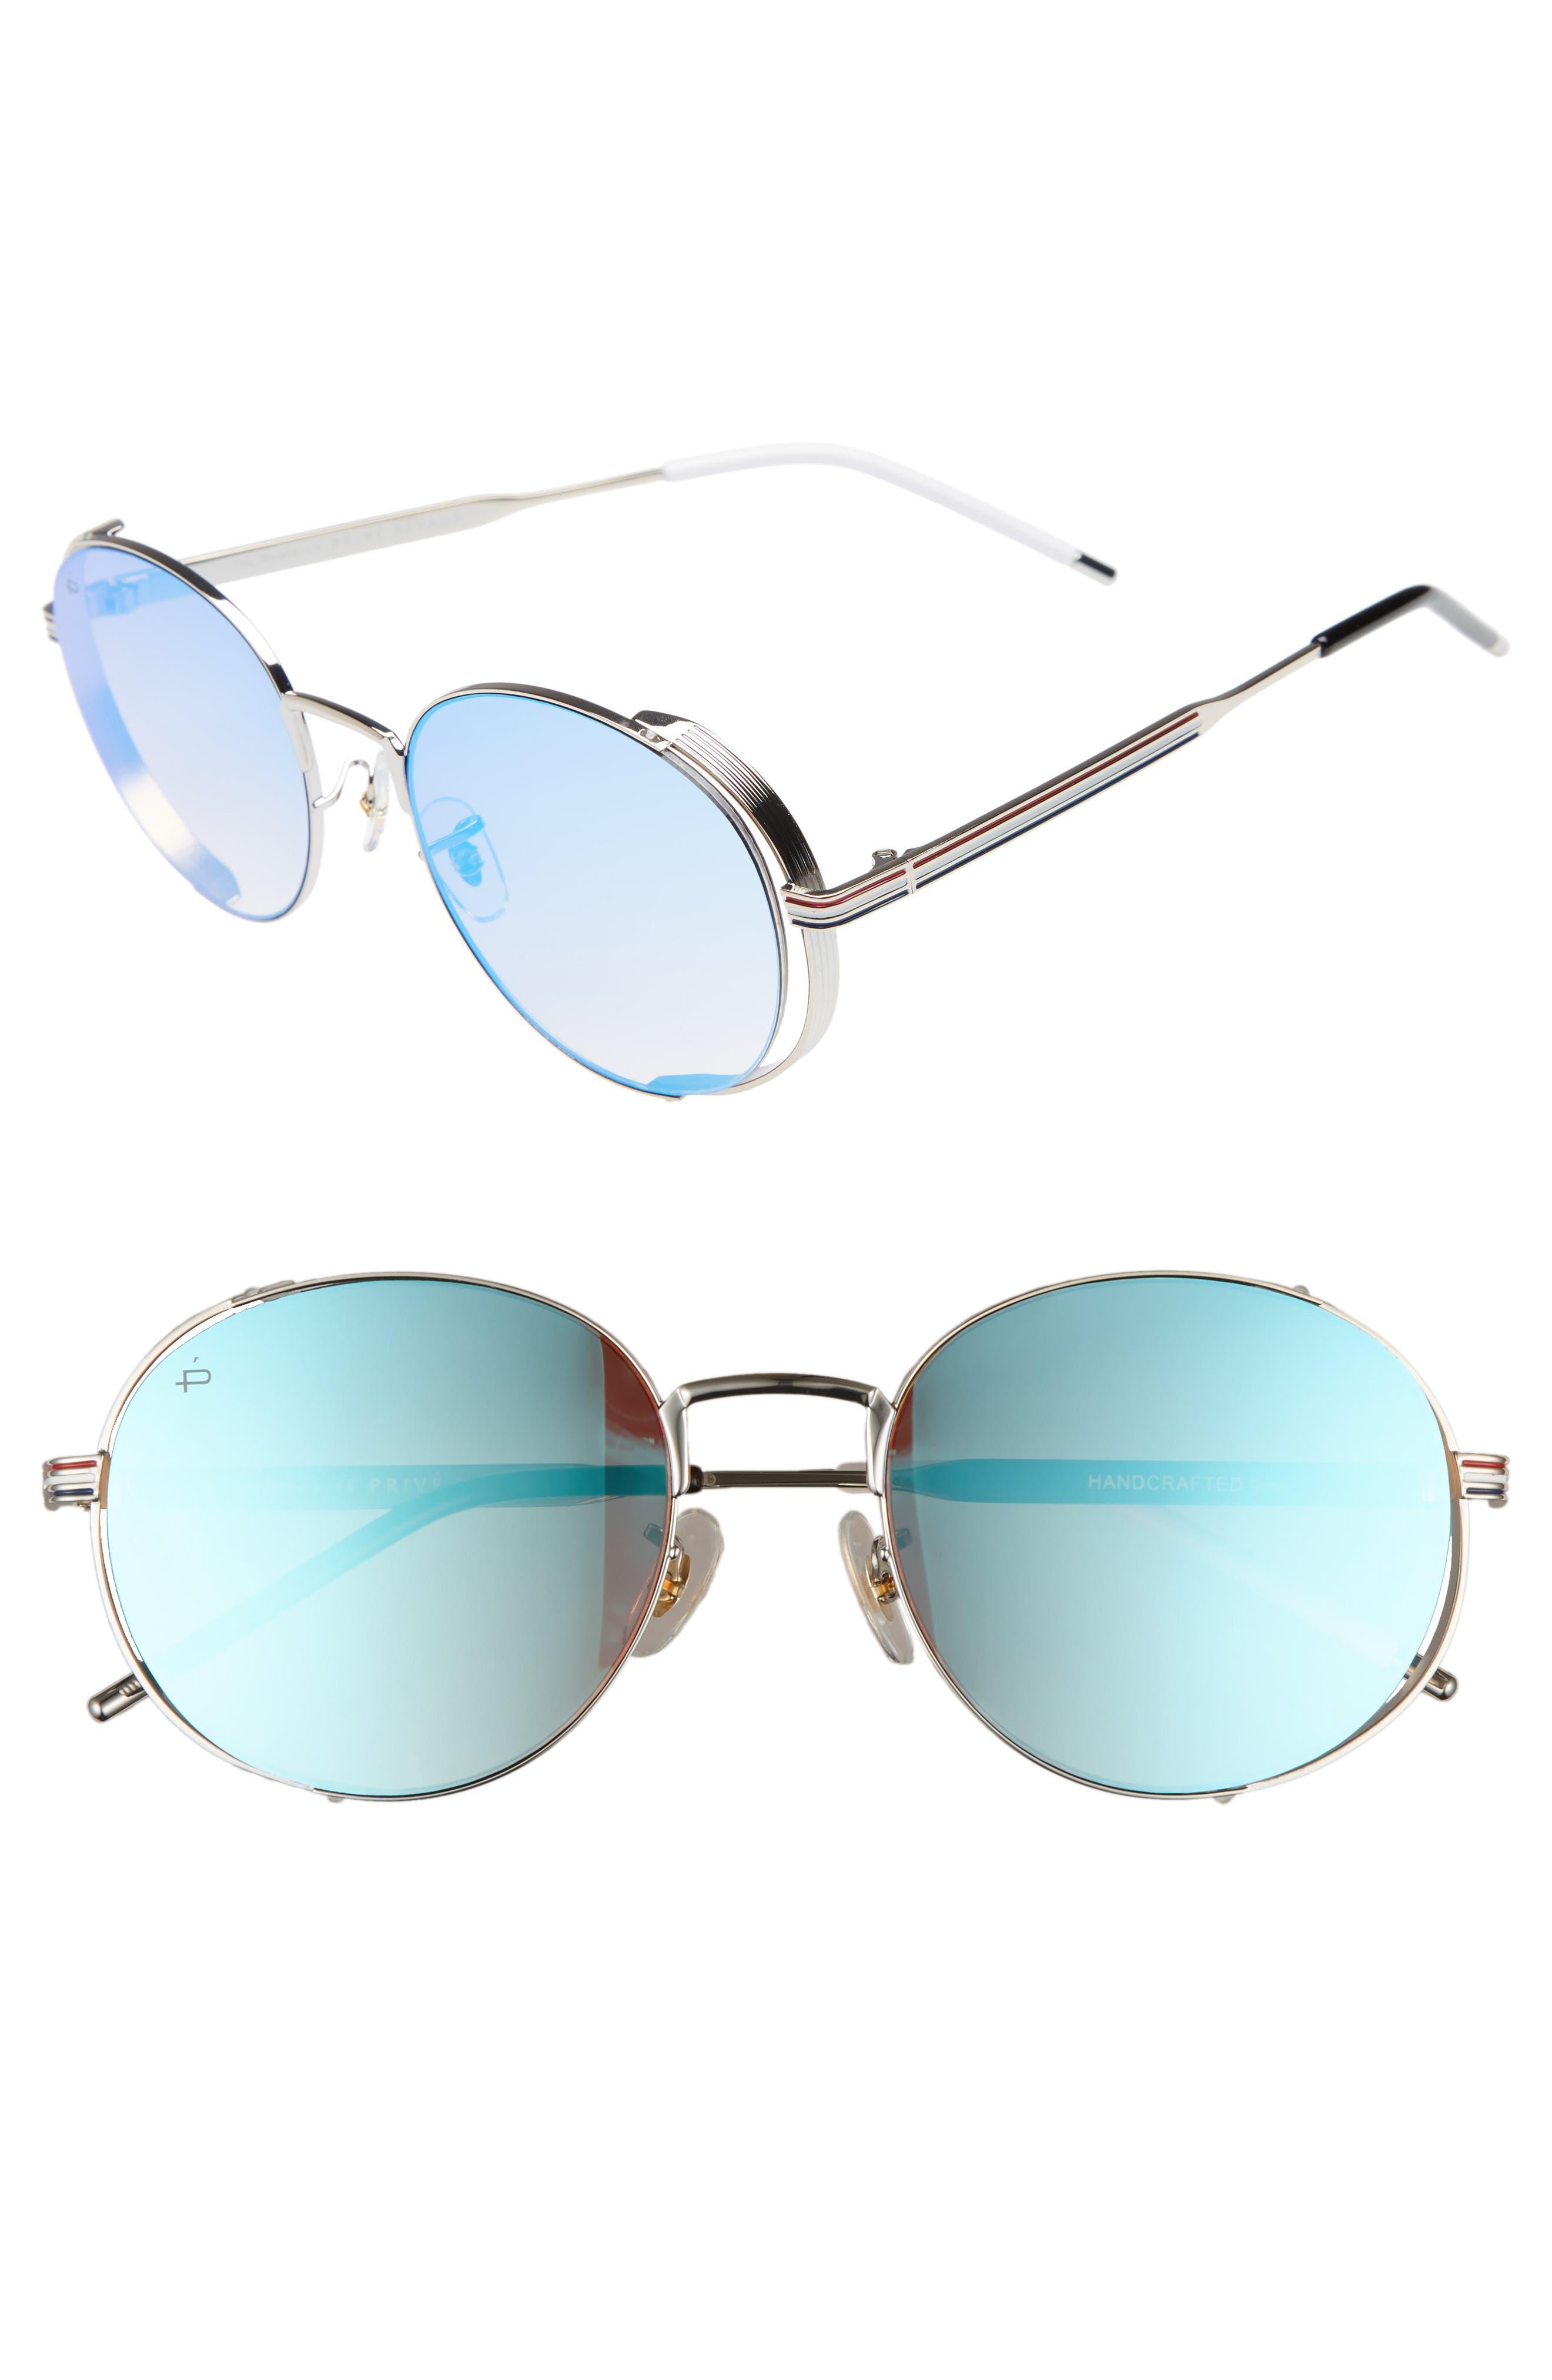 Privé Revaux The Riviera Round Sunglasses,                         Main,                         color, Blue